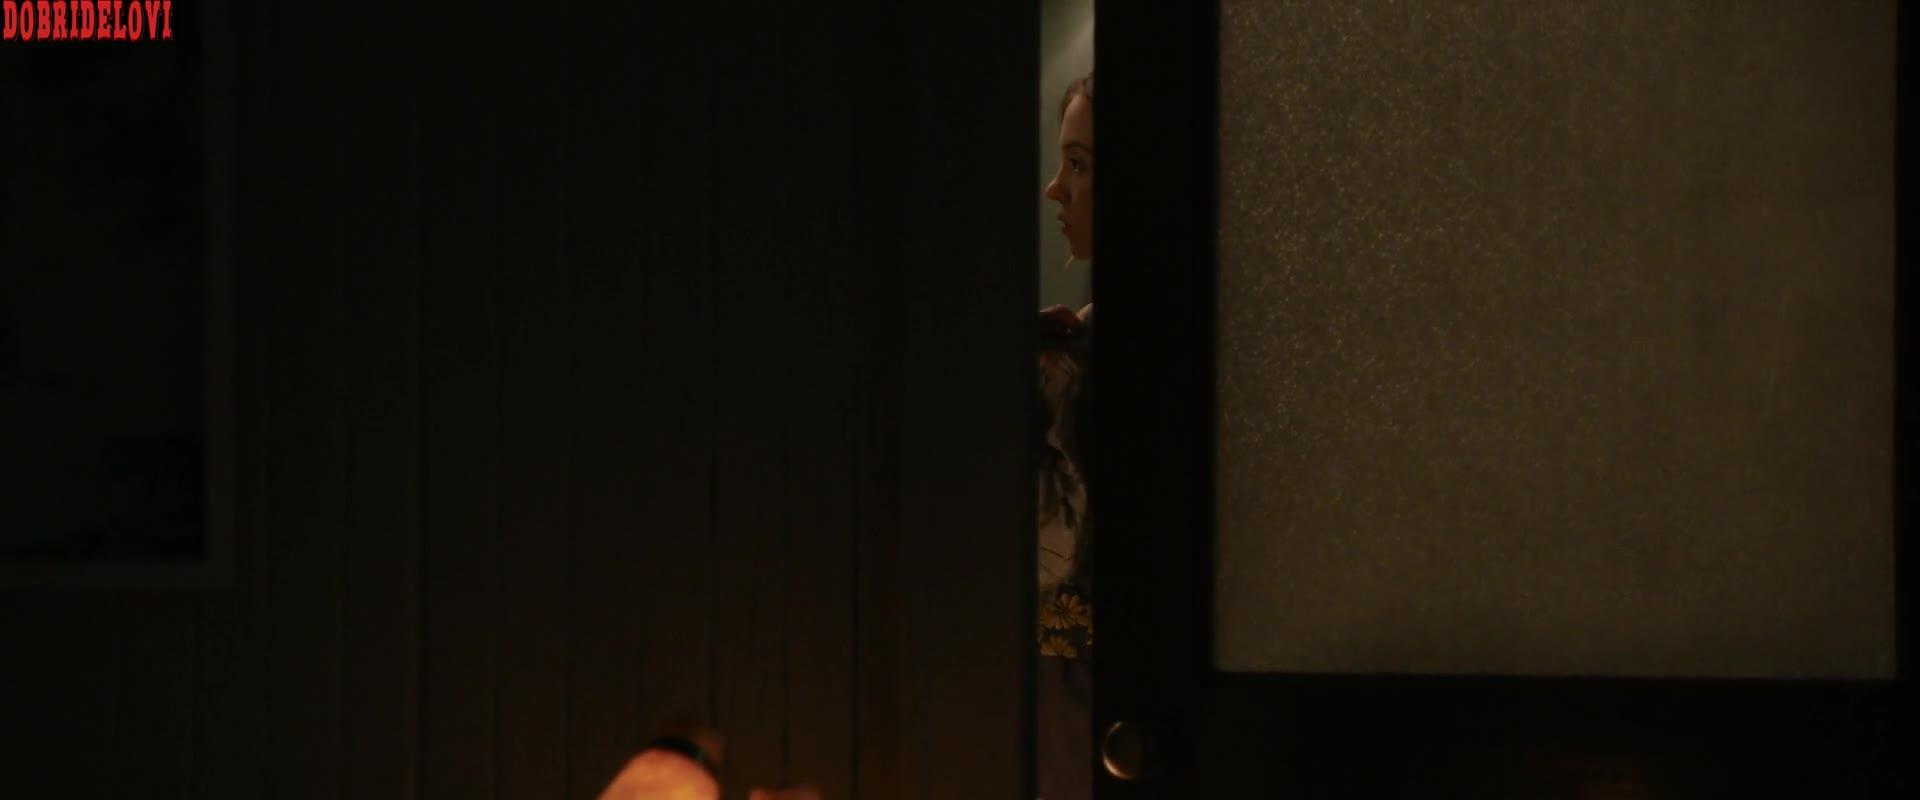 Sydney Sweeney undresses scene from The Voyeurs